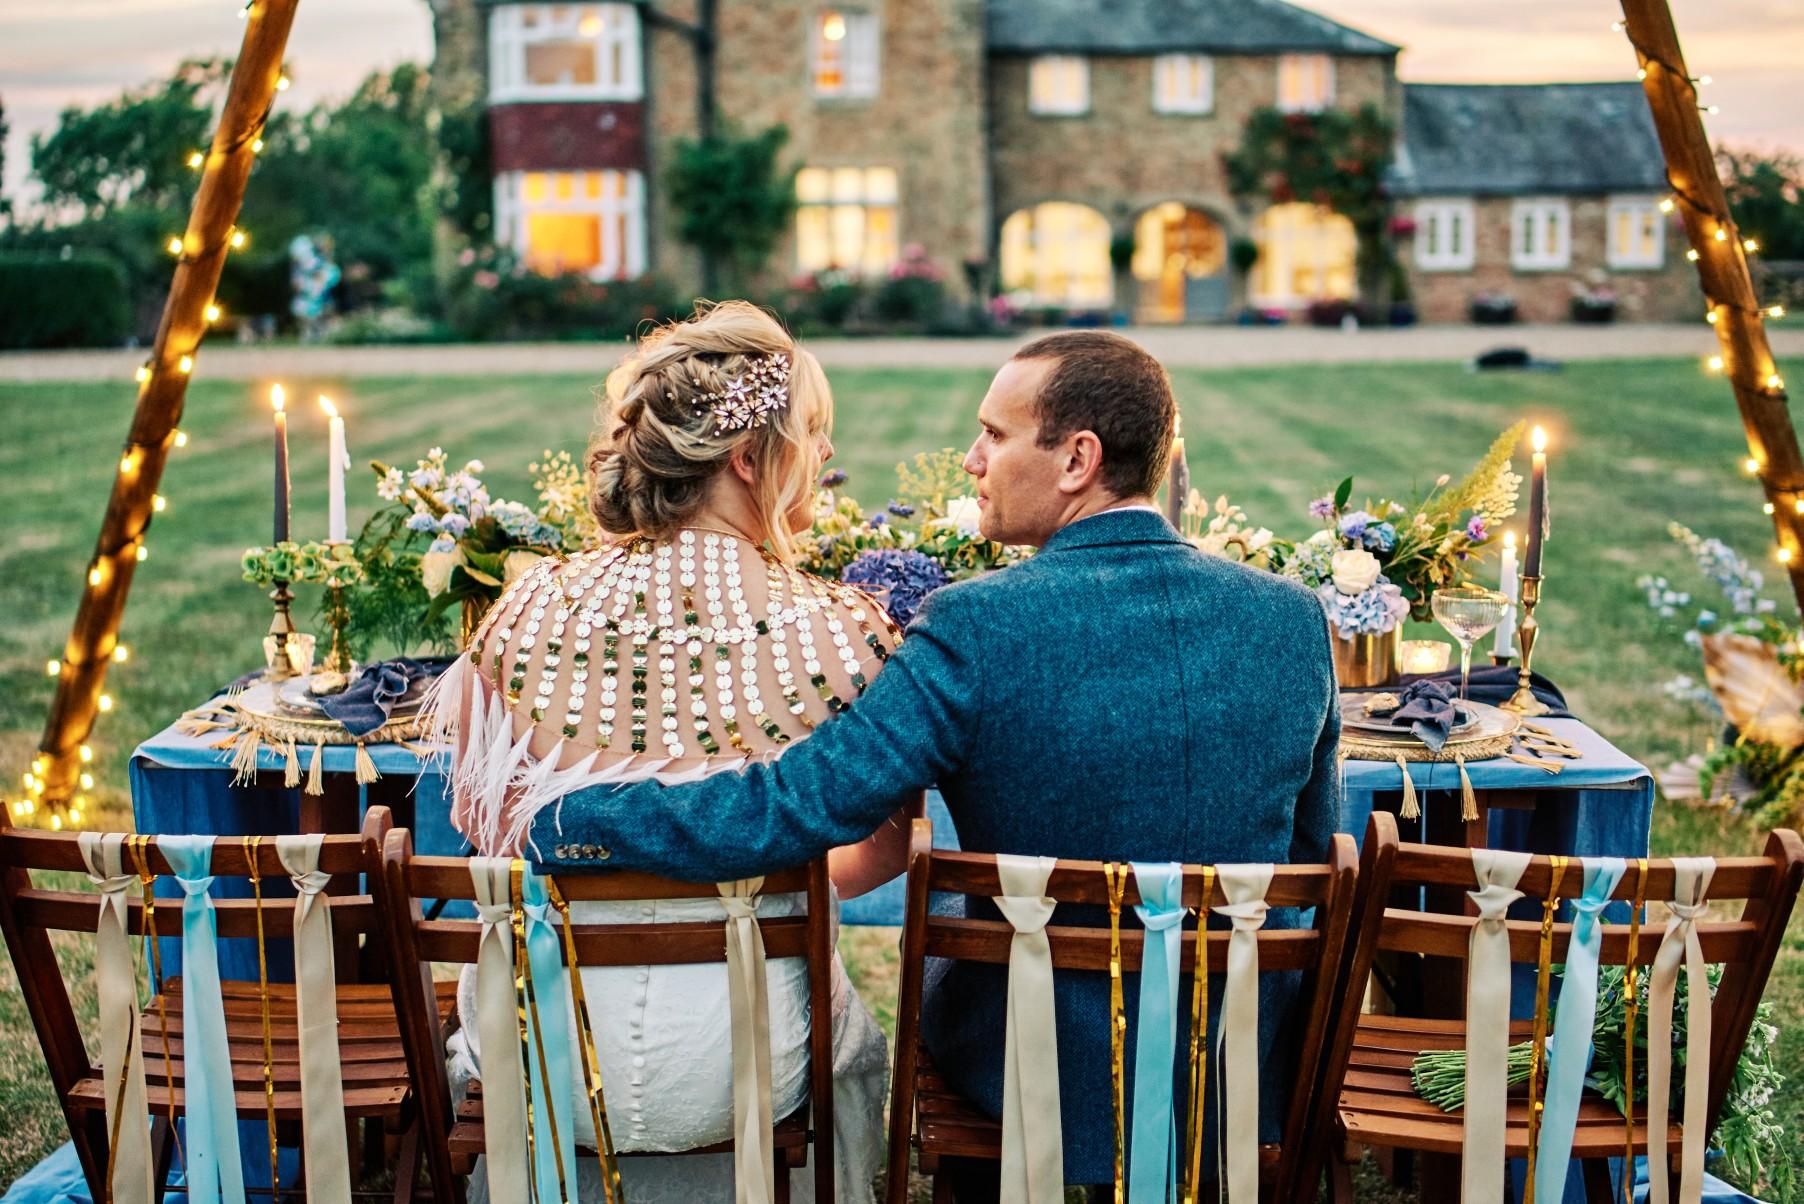 nhs wedding - paramedic wedding - blue and gold wedding - outdoor wedding - micro wedding - surprise wedding - festival wedding styling